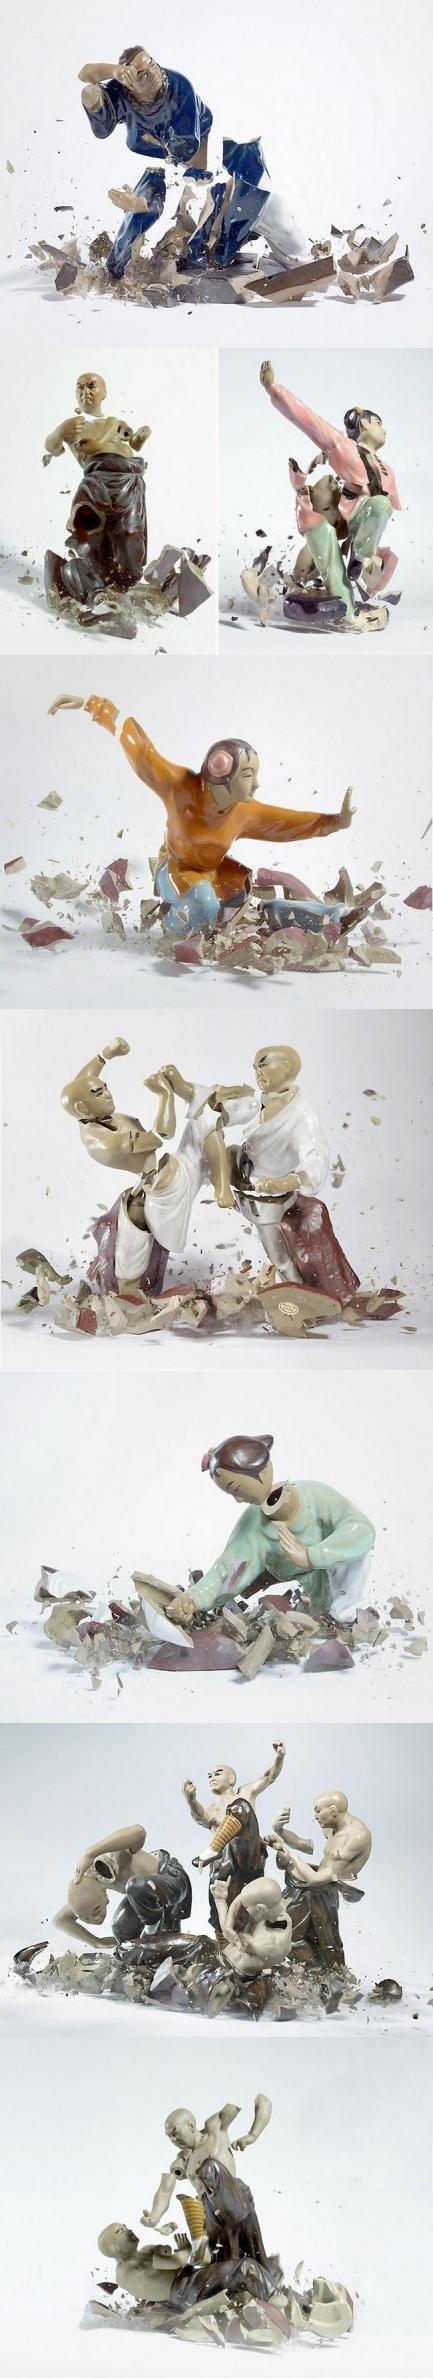 Amazing Shattering Porcelain Figurines by Martin Klimas